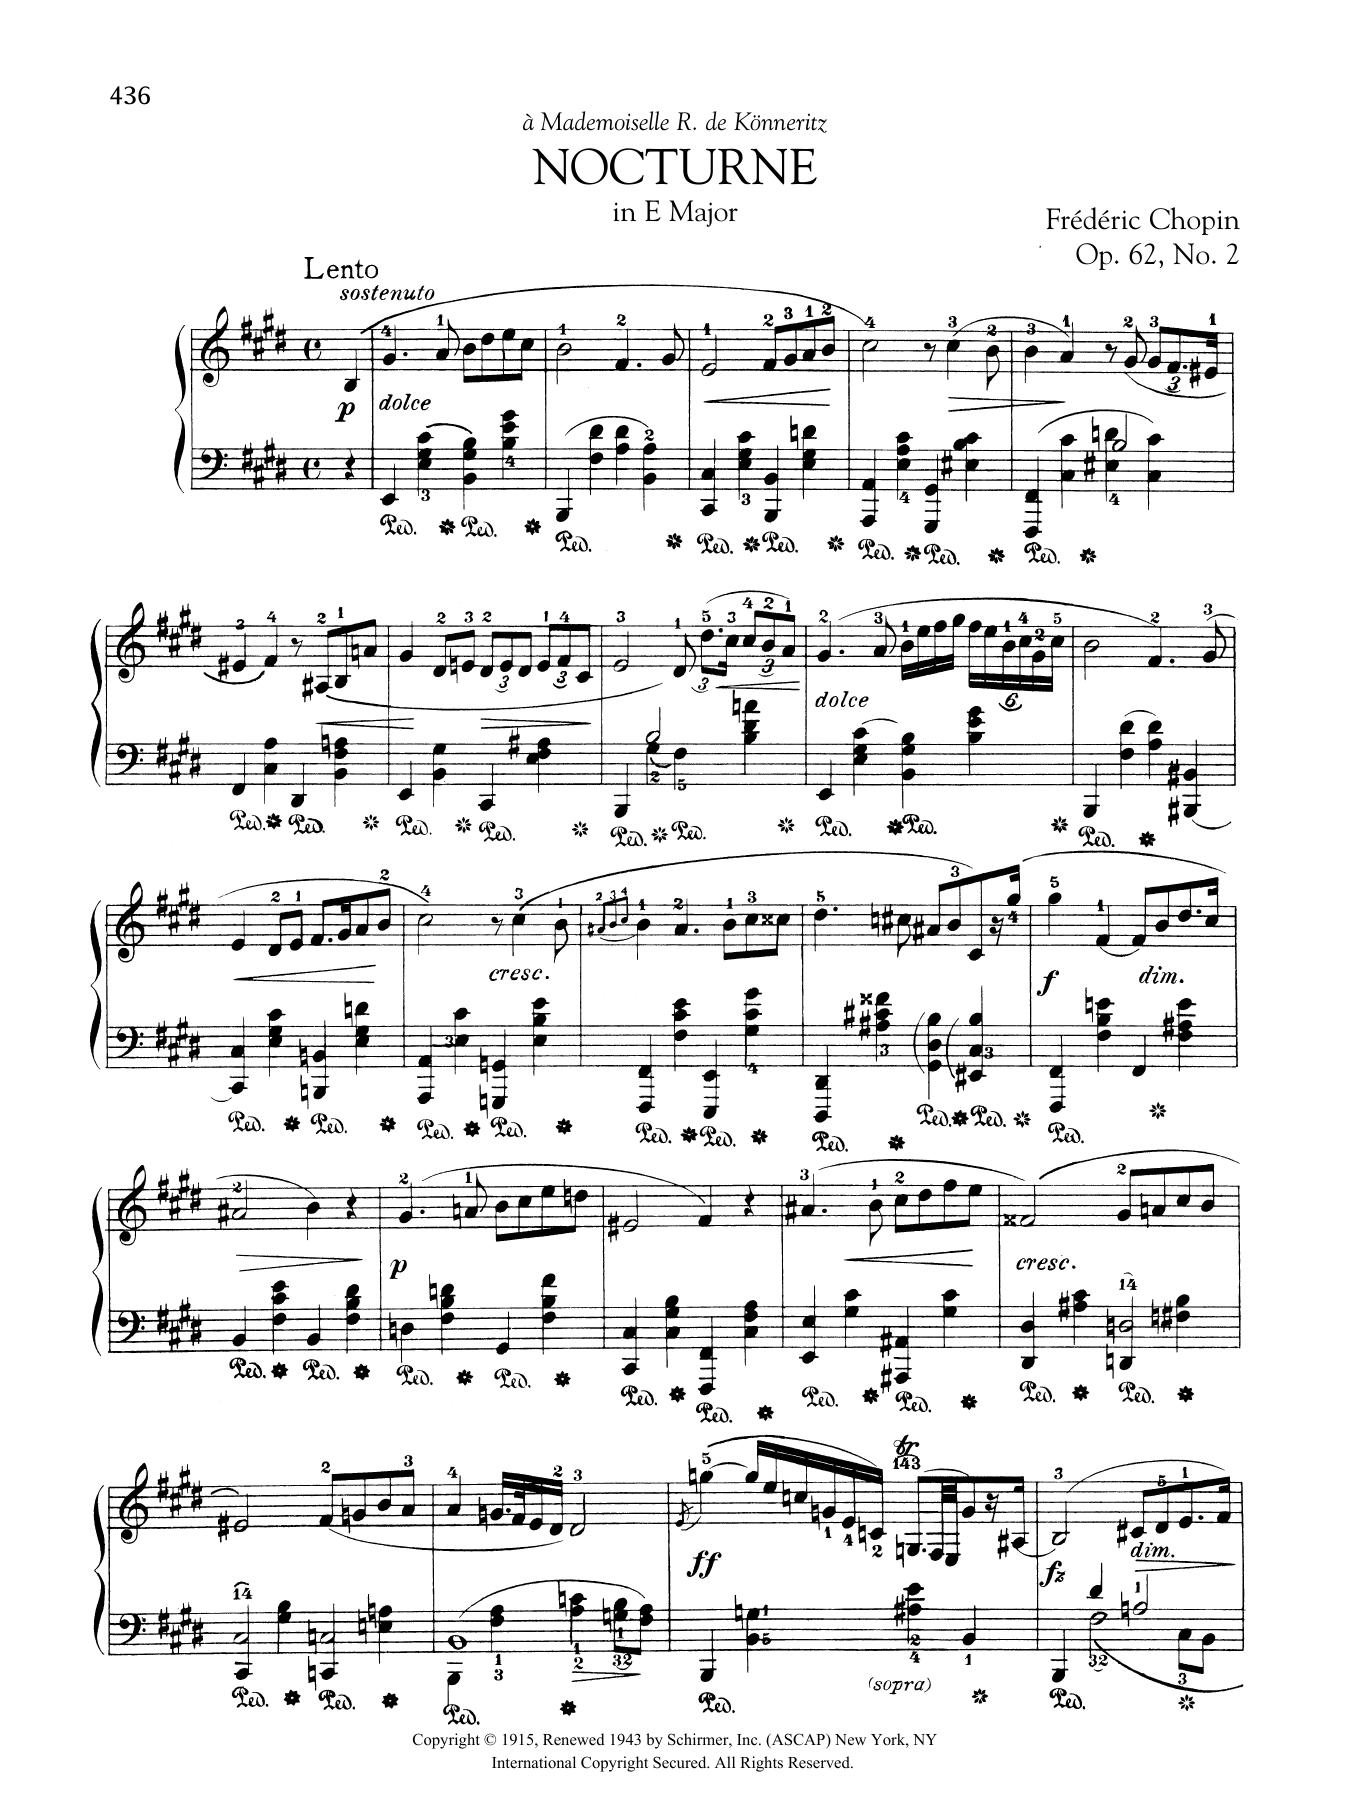 Nocturne in E Major, Op. 62, No. 2 Sheet Music